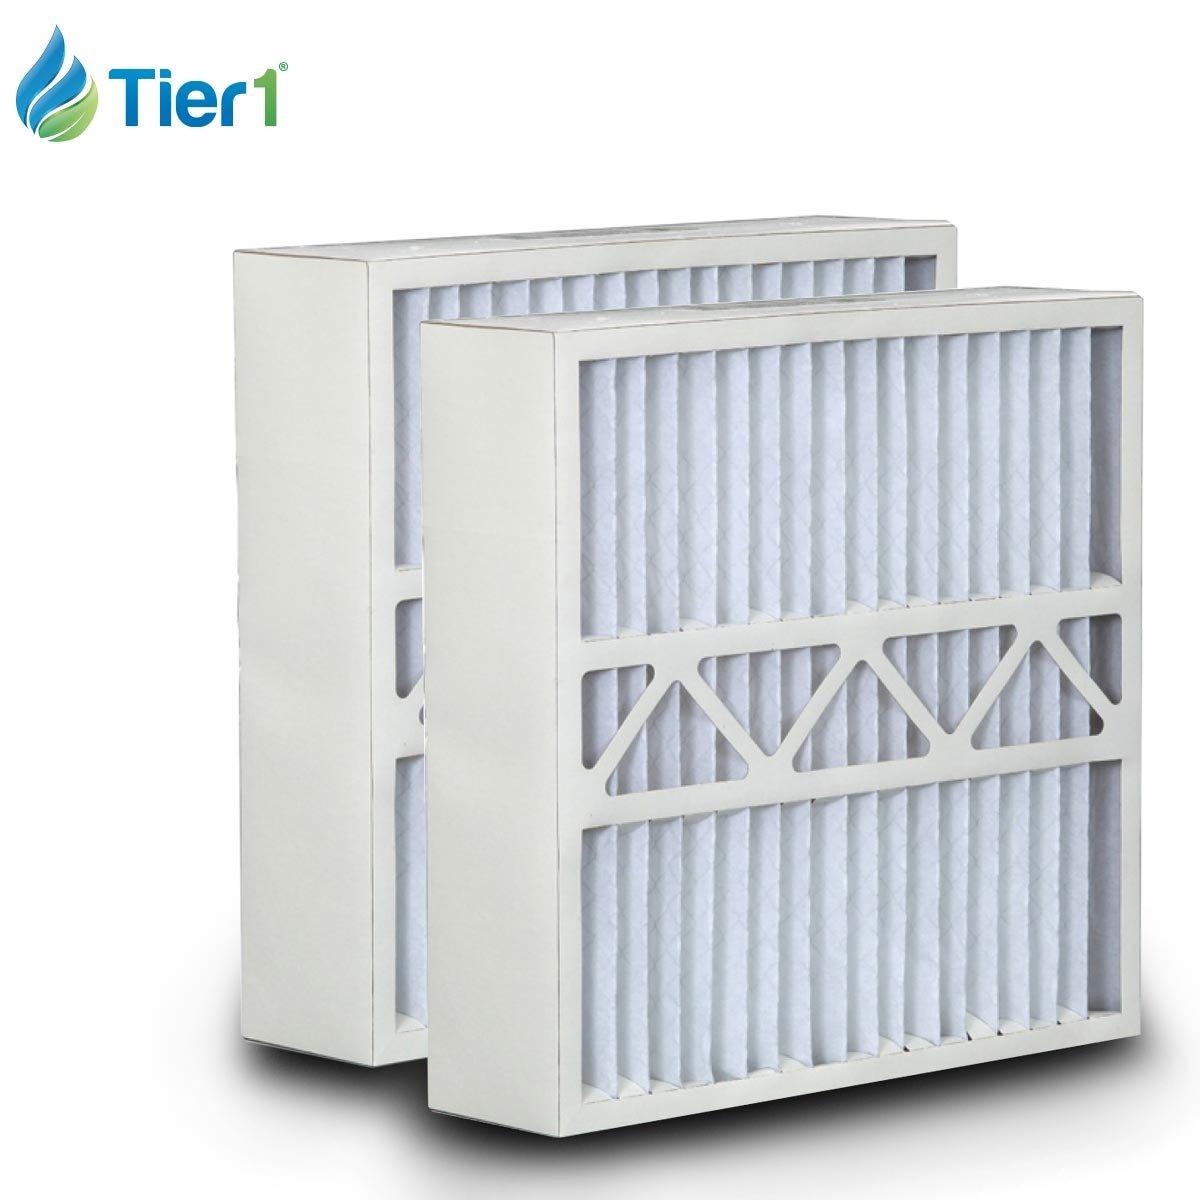 Lennox X0585 20x20x5 MERV 13 Comparable Air Filter - 2PK